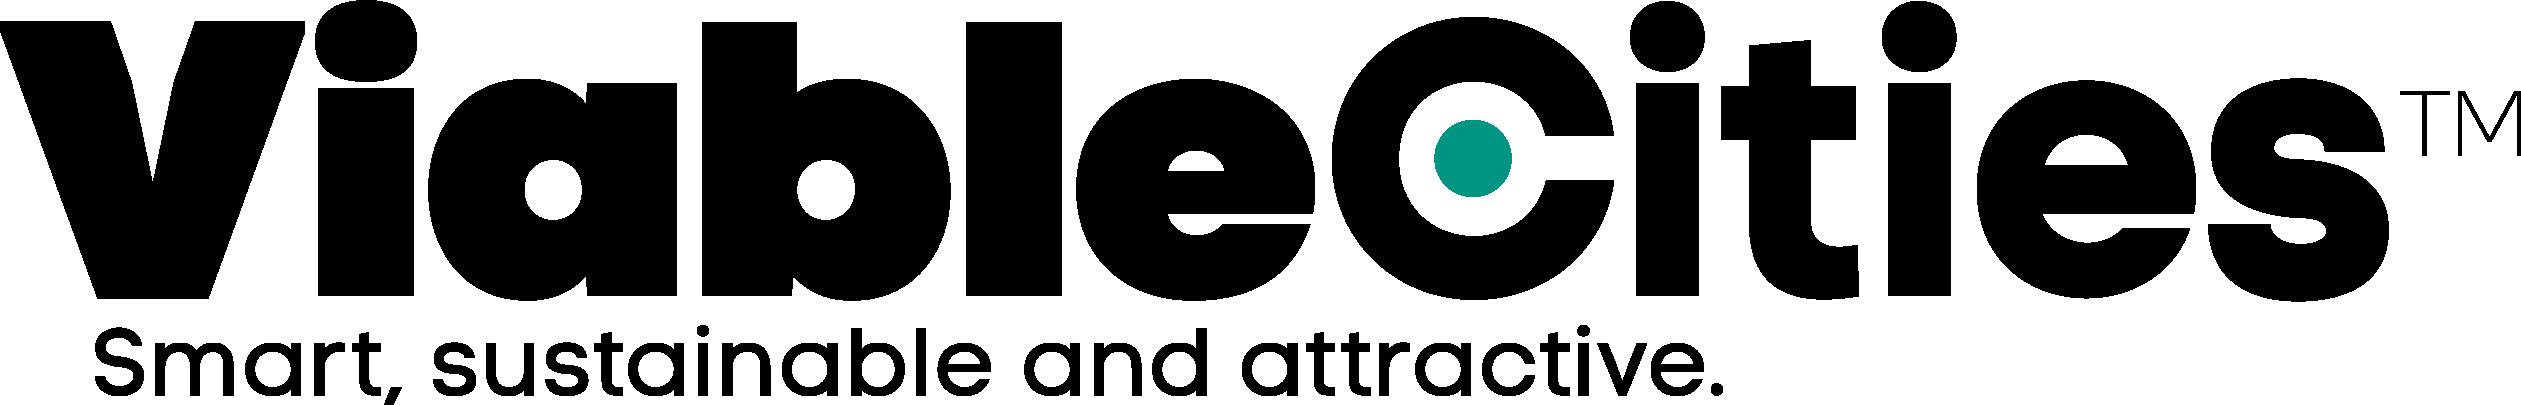 Viable Cities logo